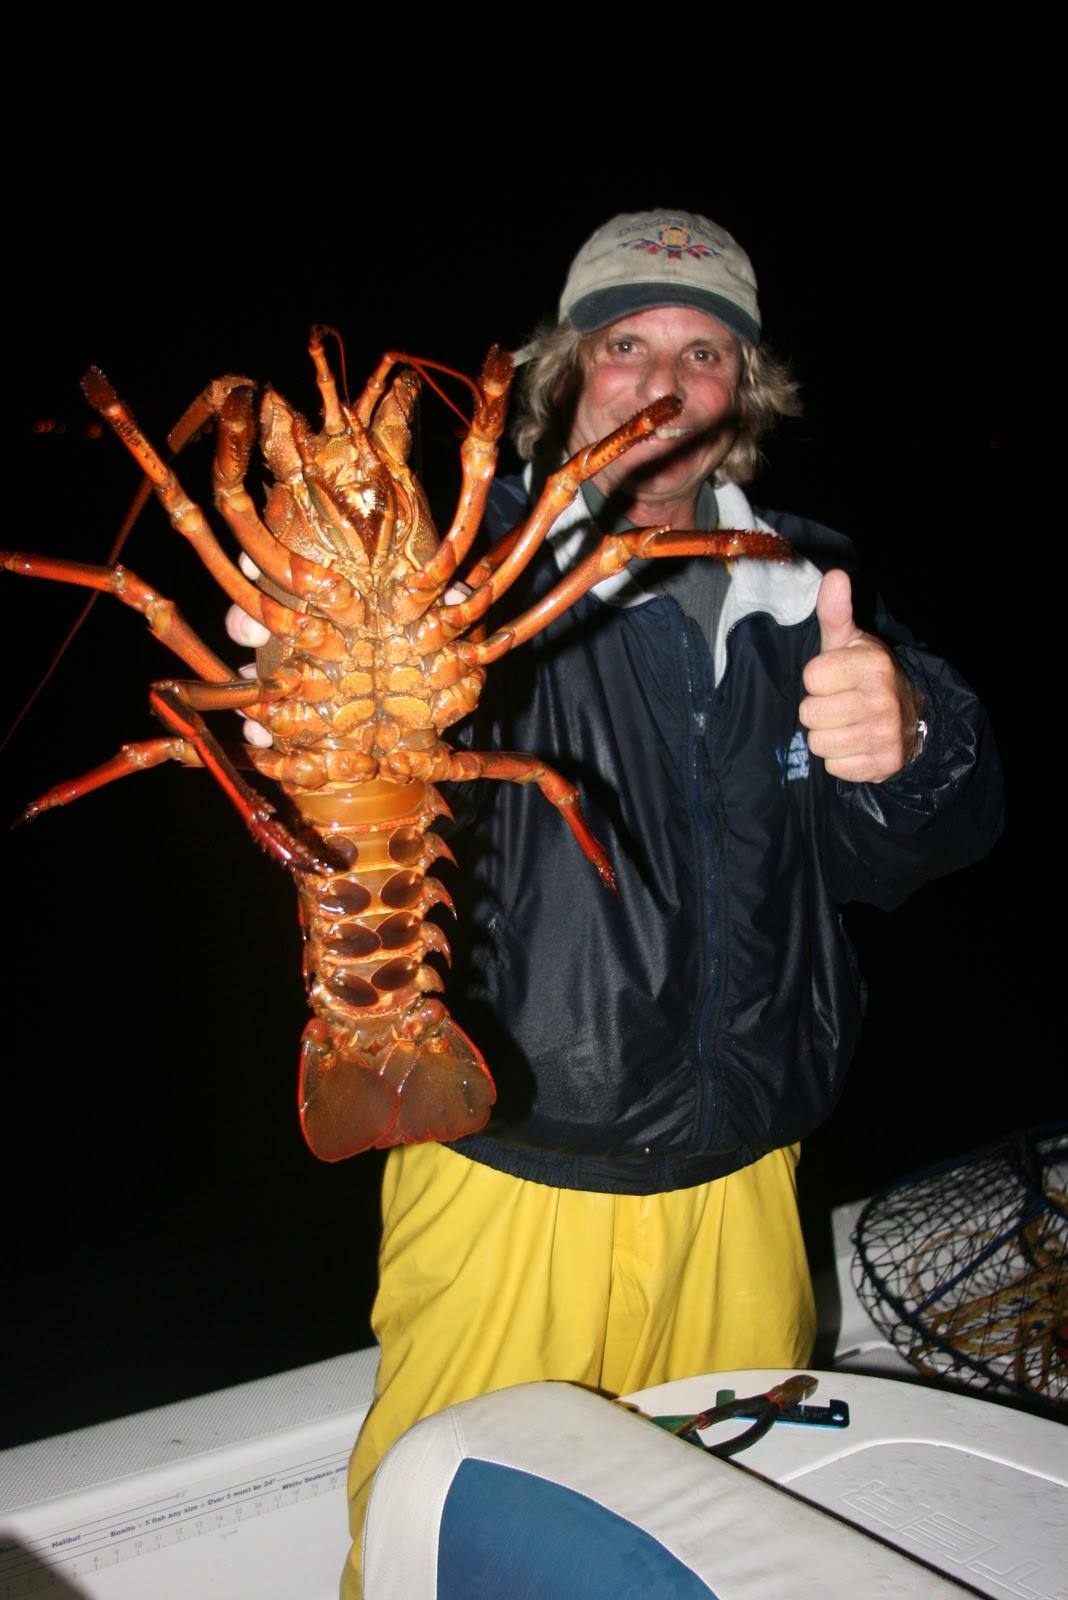 Dan 39 S Journal Lobster Fishing Last Night